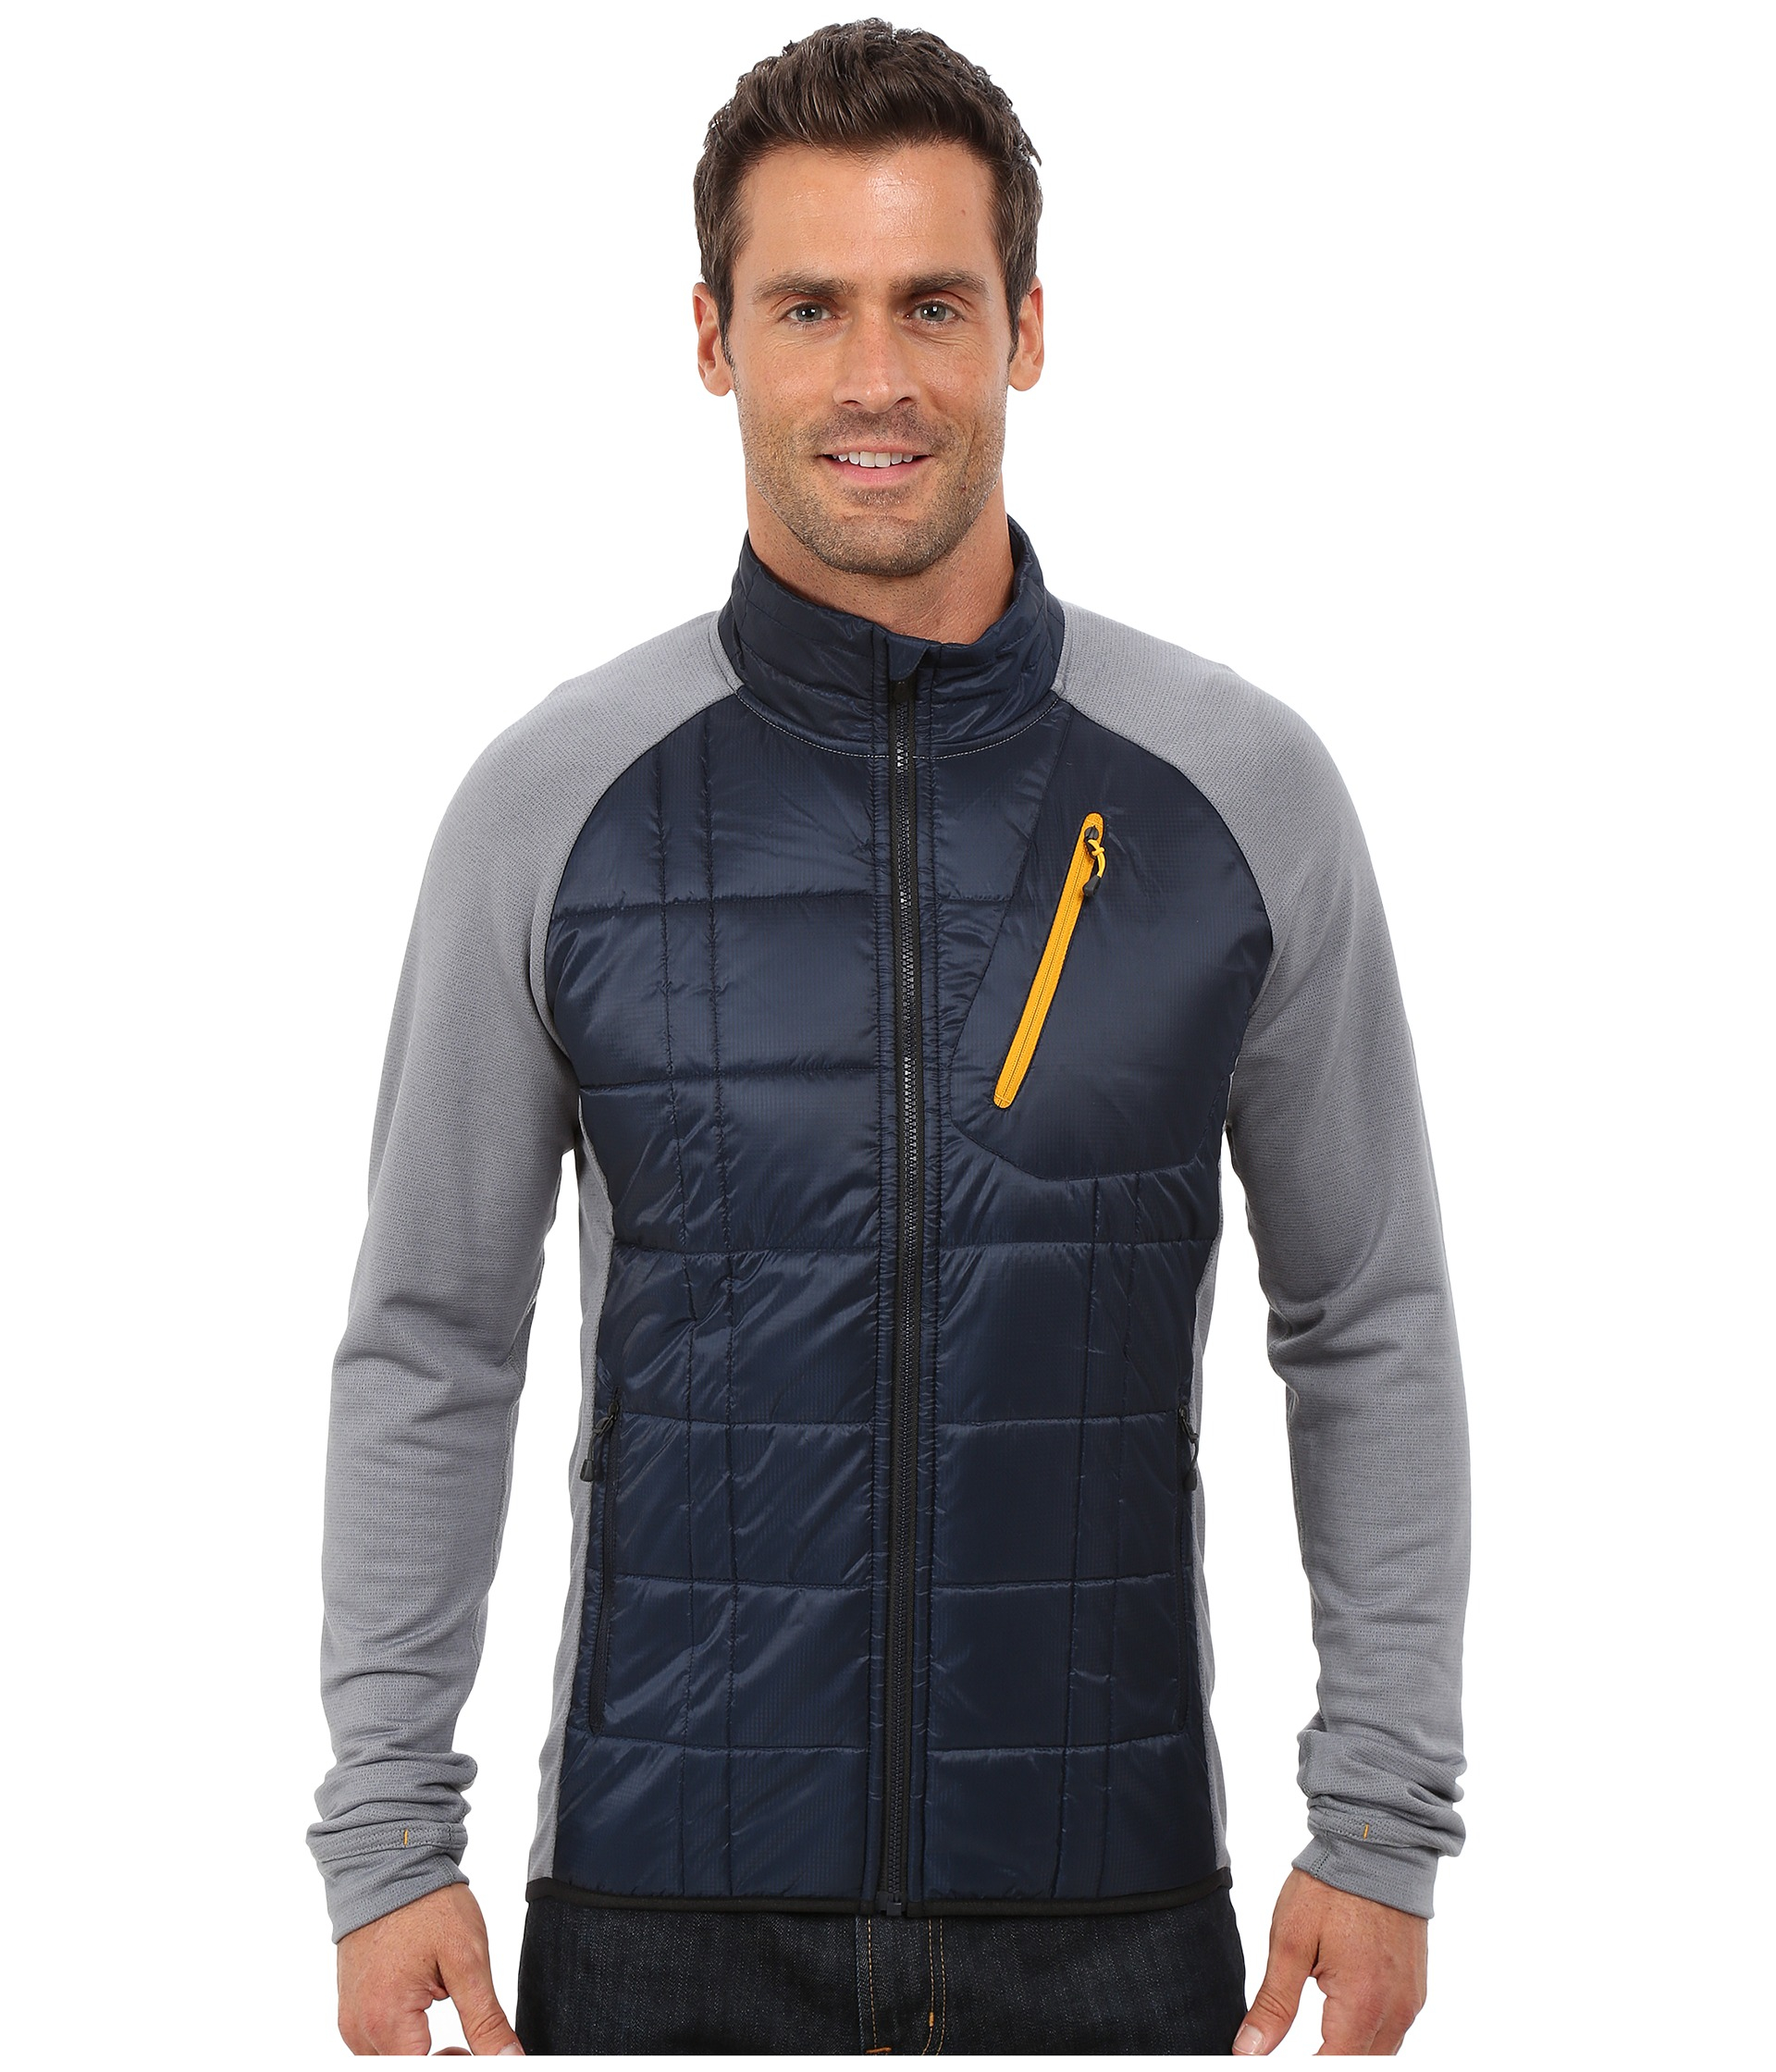 e321bf8118424 smartwool-deep-navy-corbet-120-jacket-blue-product-0-007468740-normal.jpeg